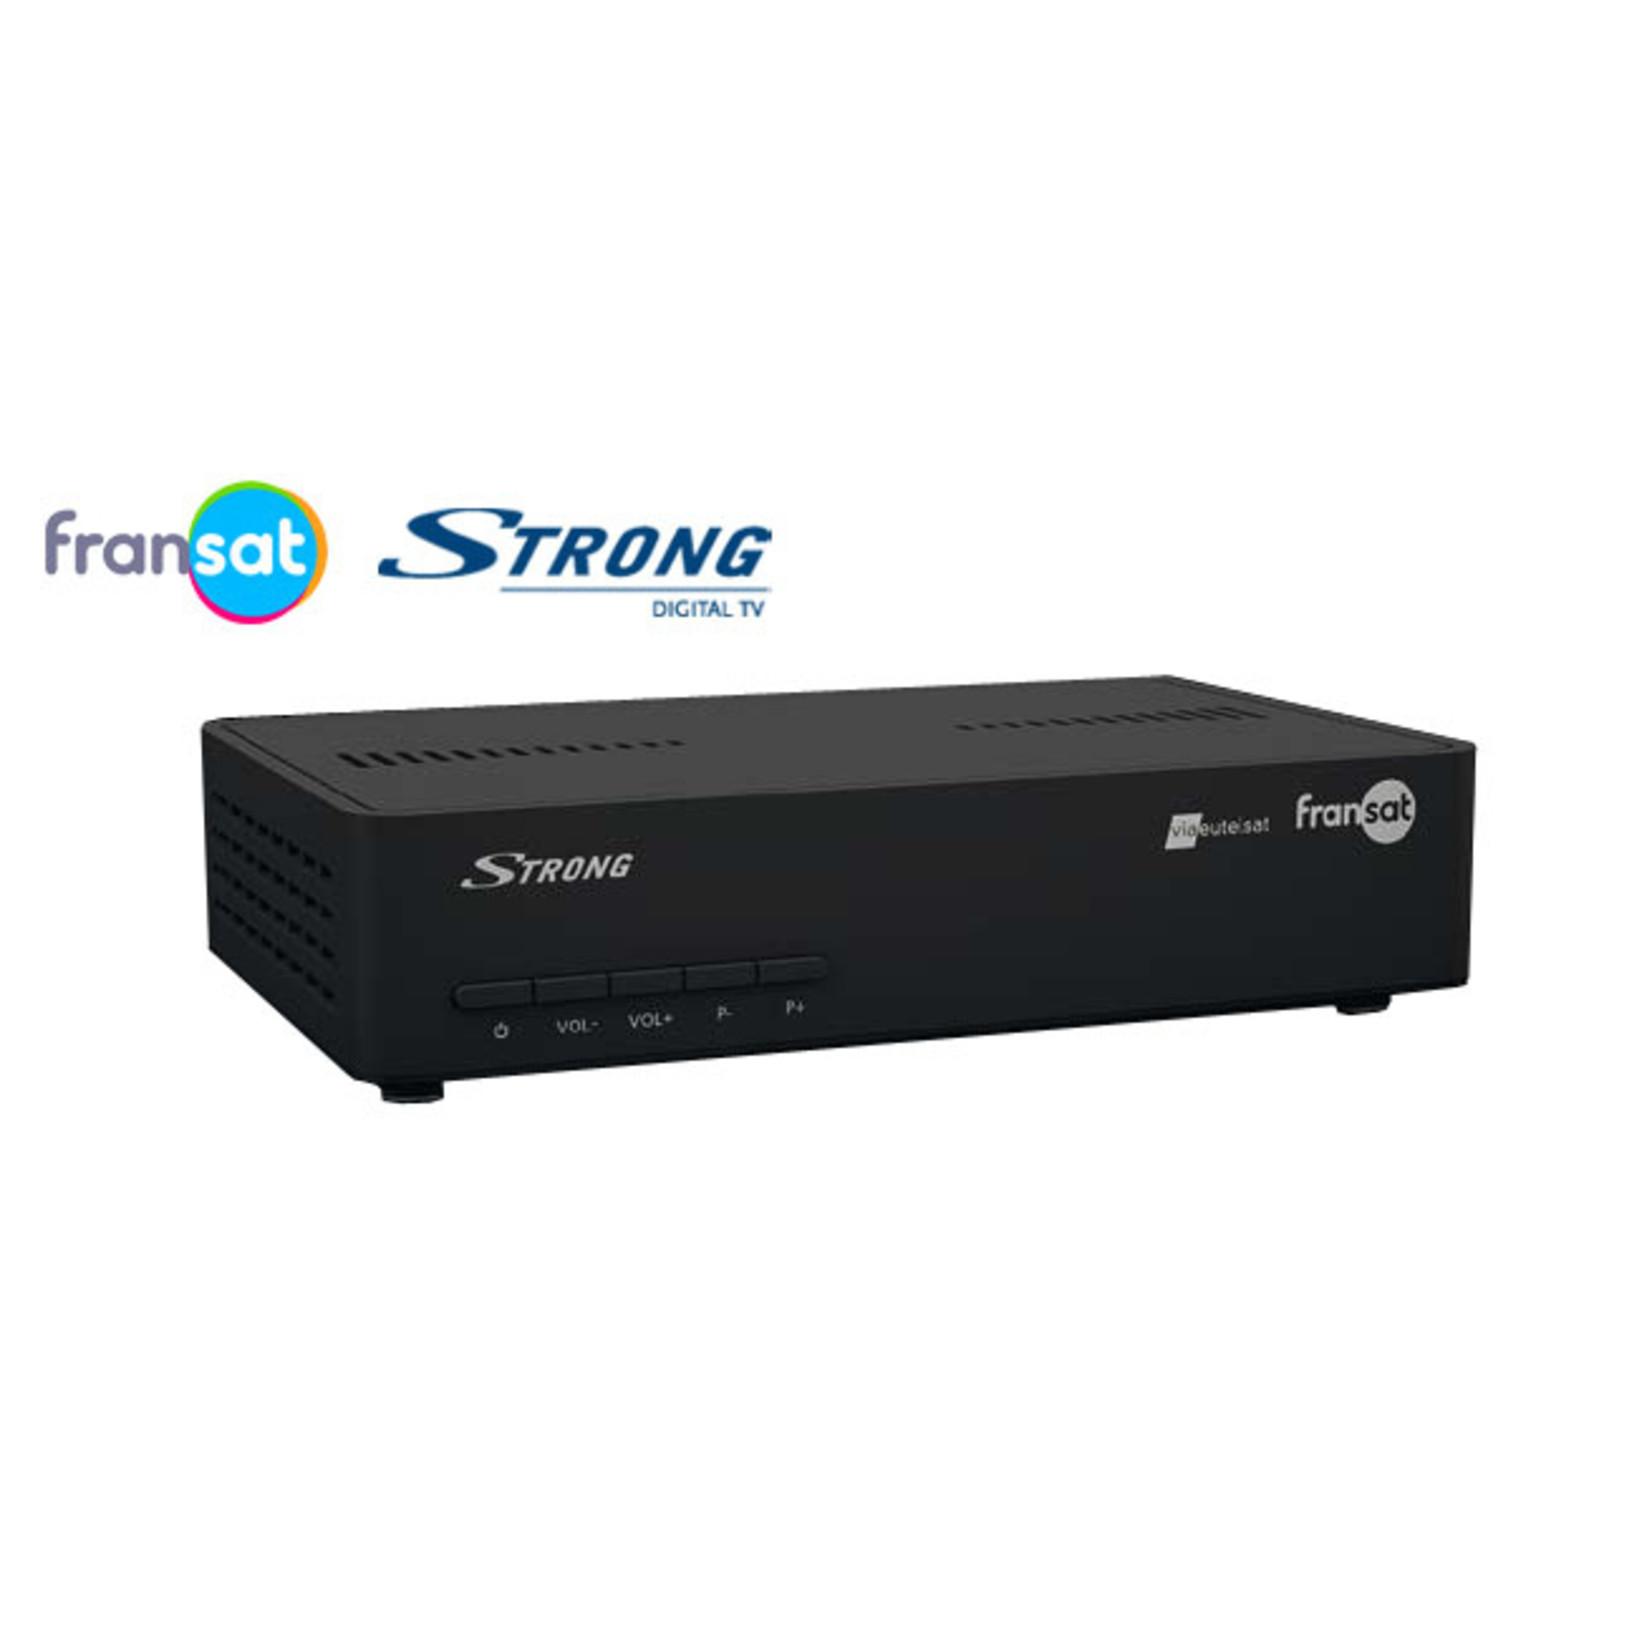 STRONG ONTVANGER FRANSAT - STRONG 7407 MET FRANSAT KAART